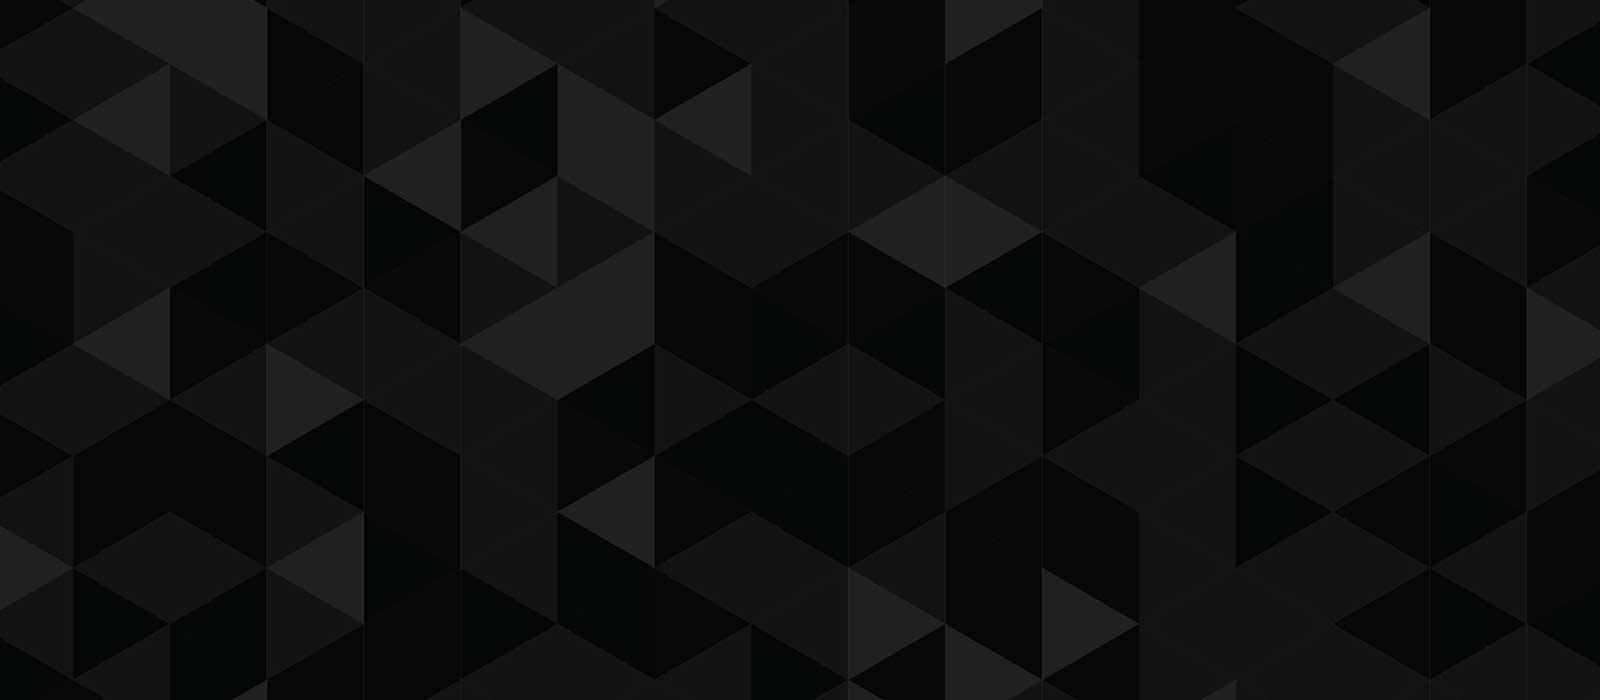 Sphere - Portfolio - Cipherhex technology